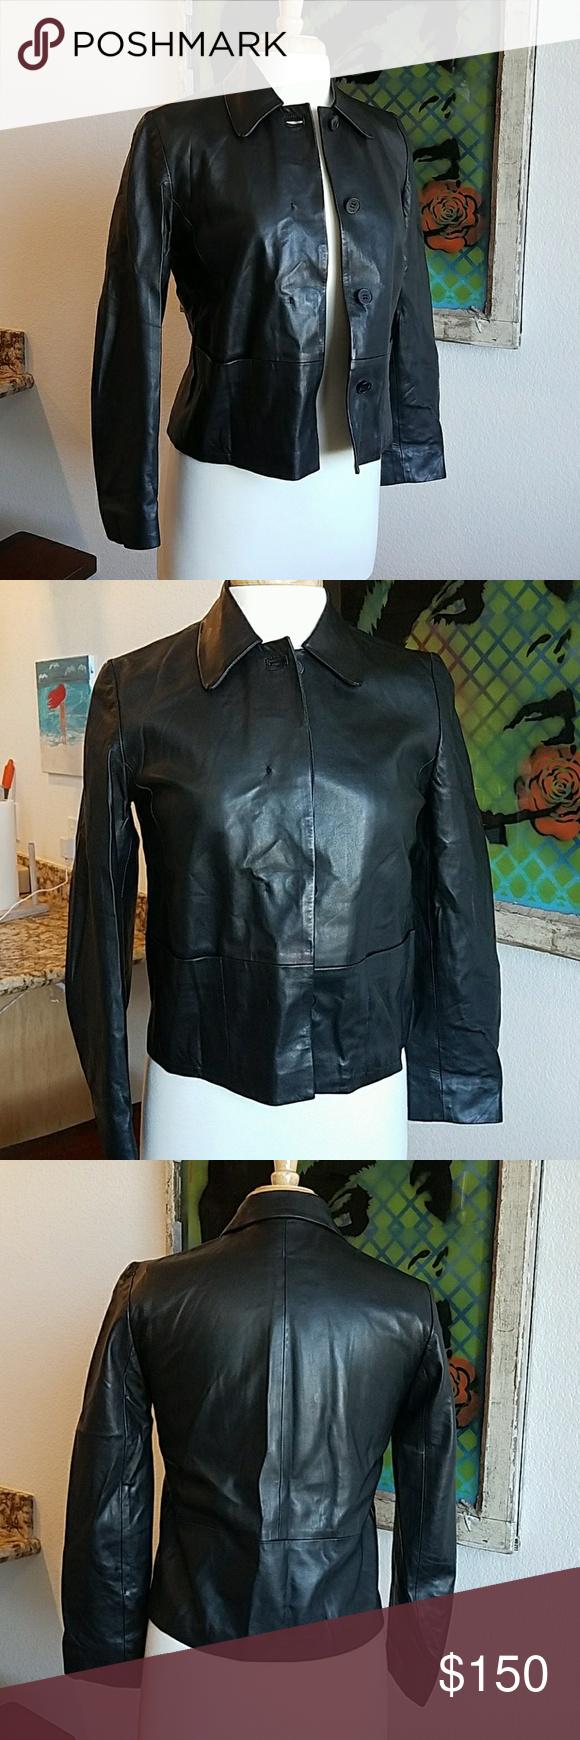 Bally black leather jacket size Pinterest